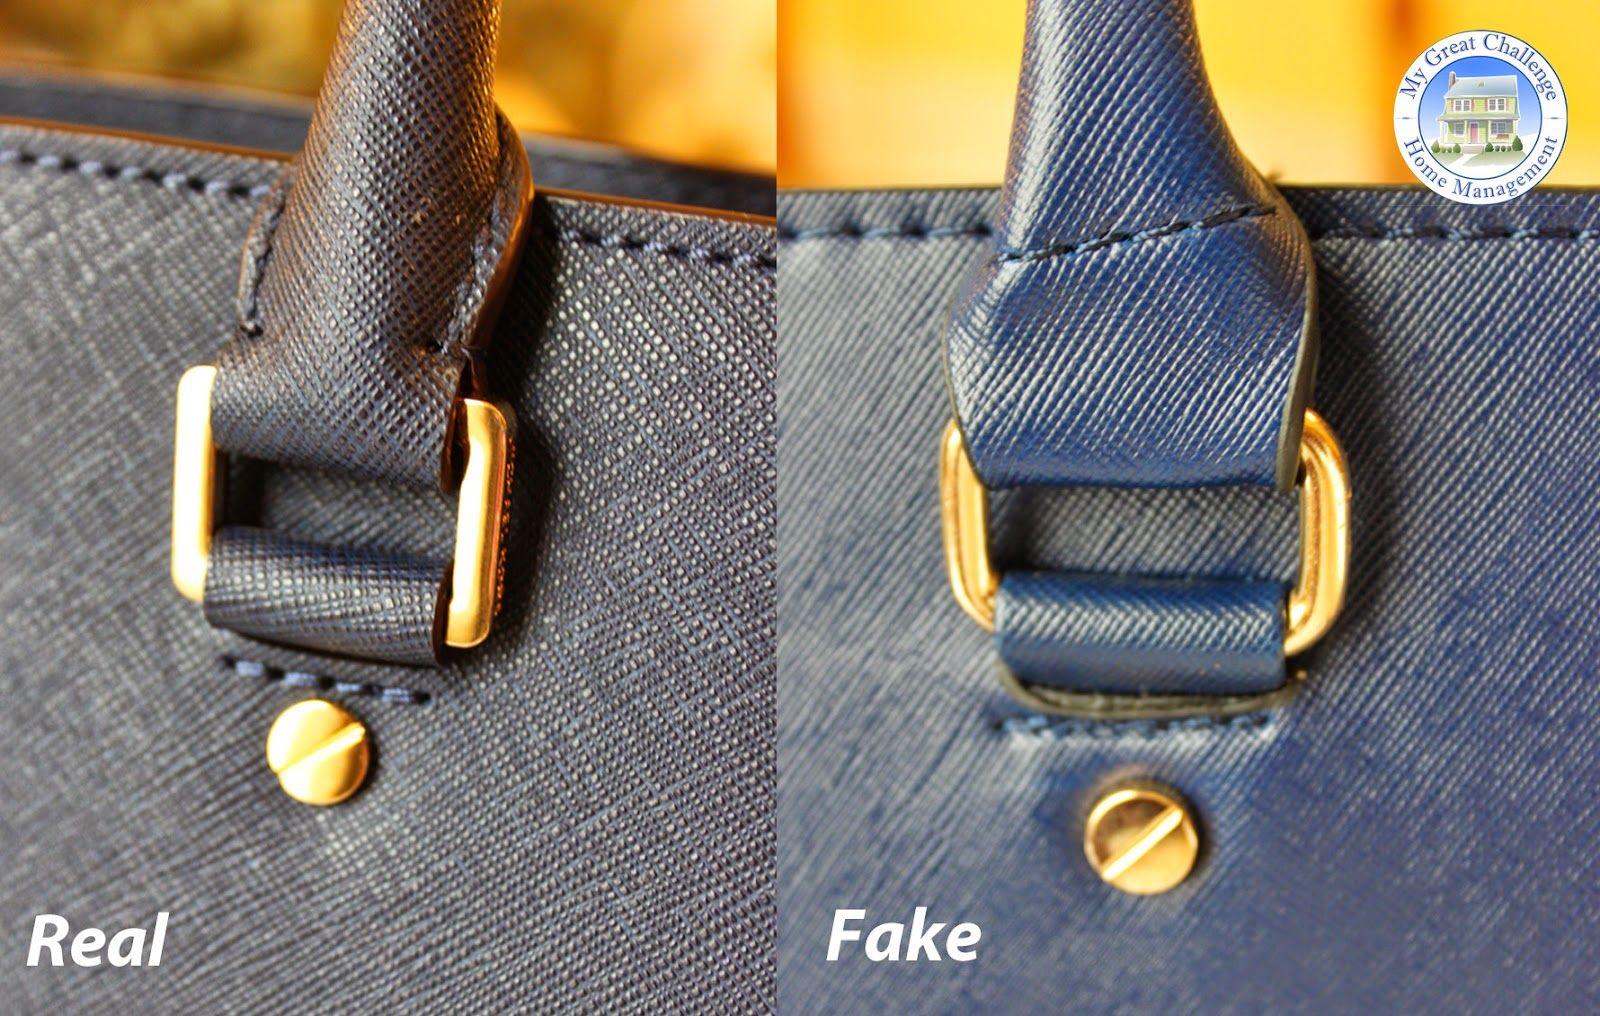 cdd611a56209 Michael Kors Handbag Hamilton Saffiano Leather E W Satchel Turquoise  Shoes